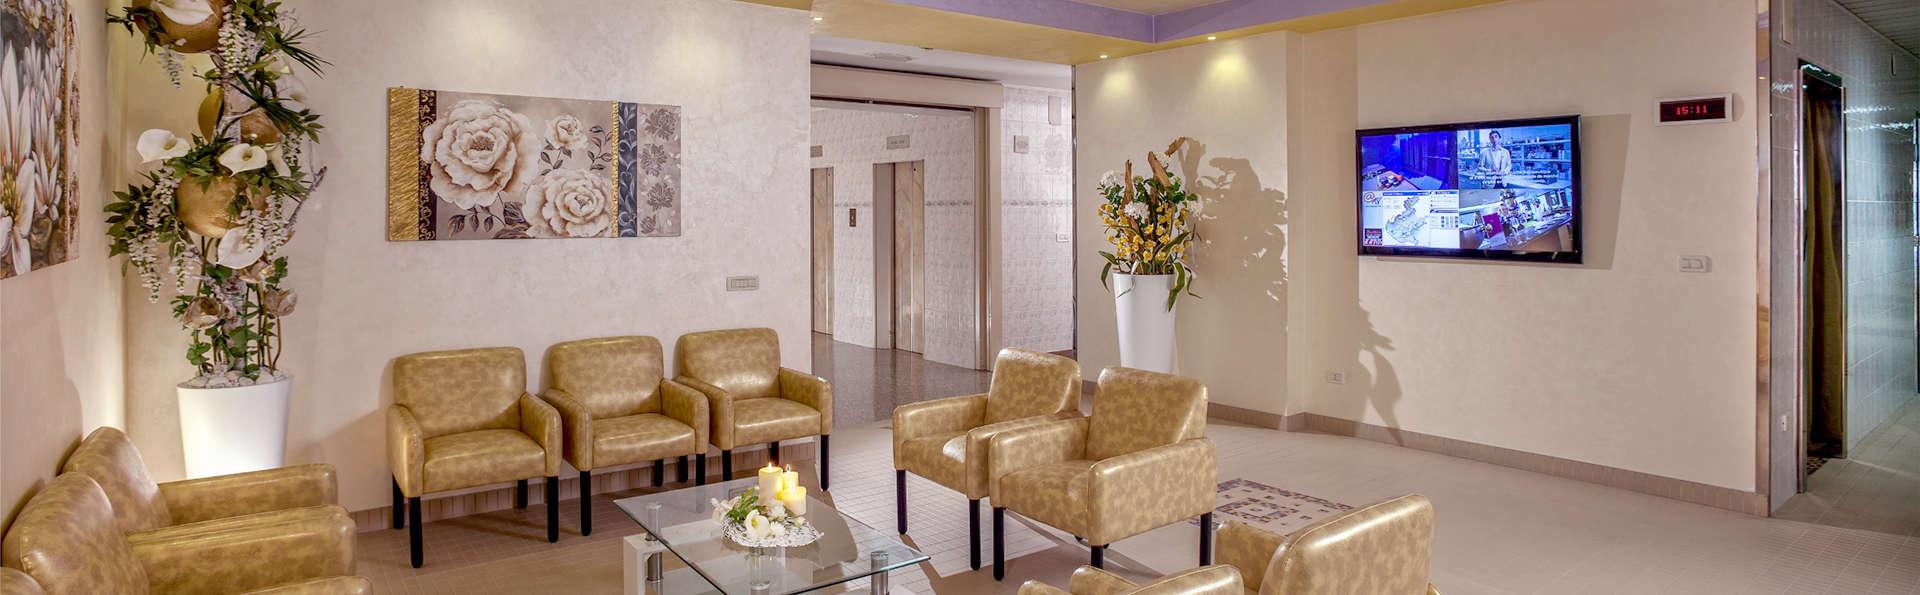 Hotel Savoia Thermae & Spa - Edit_Lobby.jpg